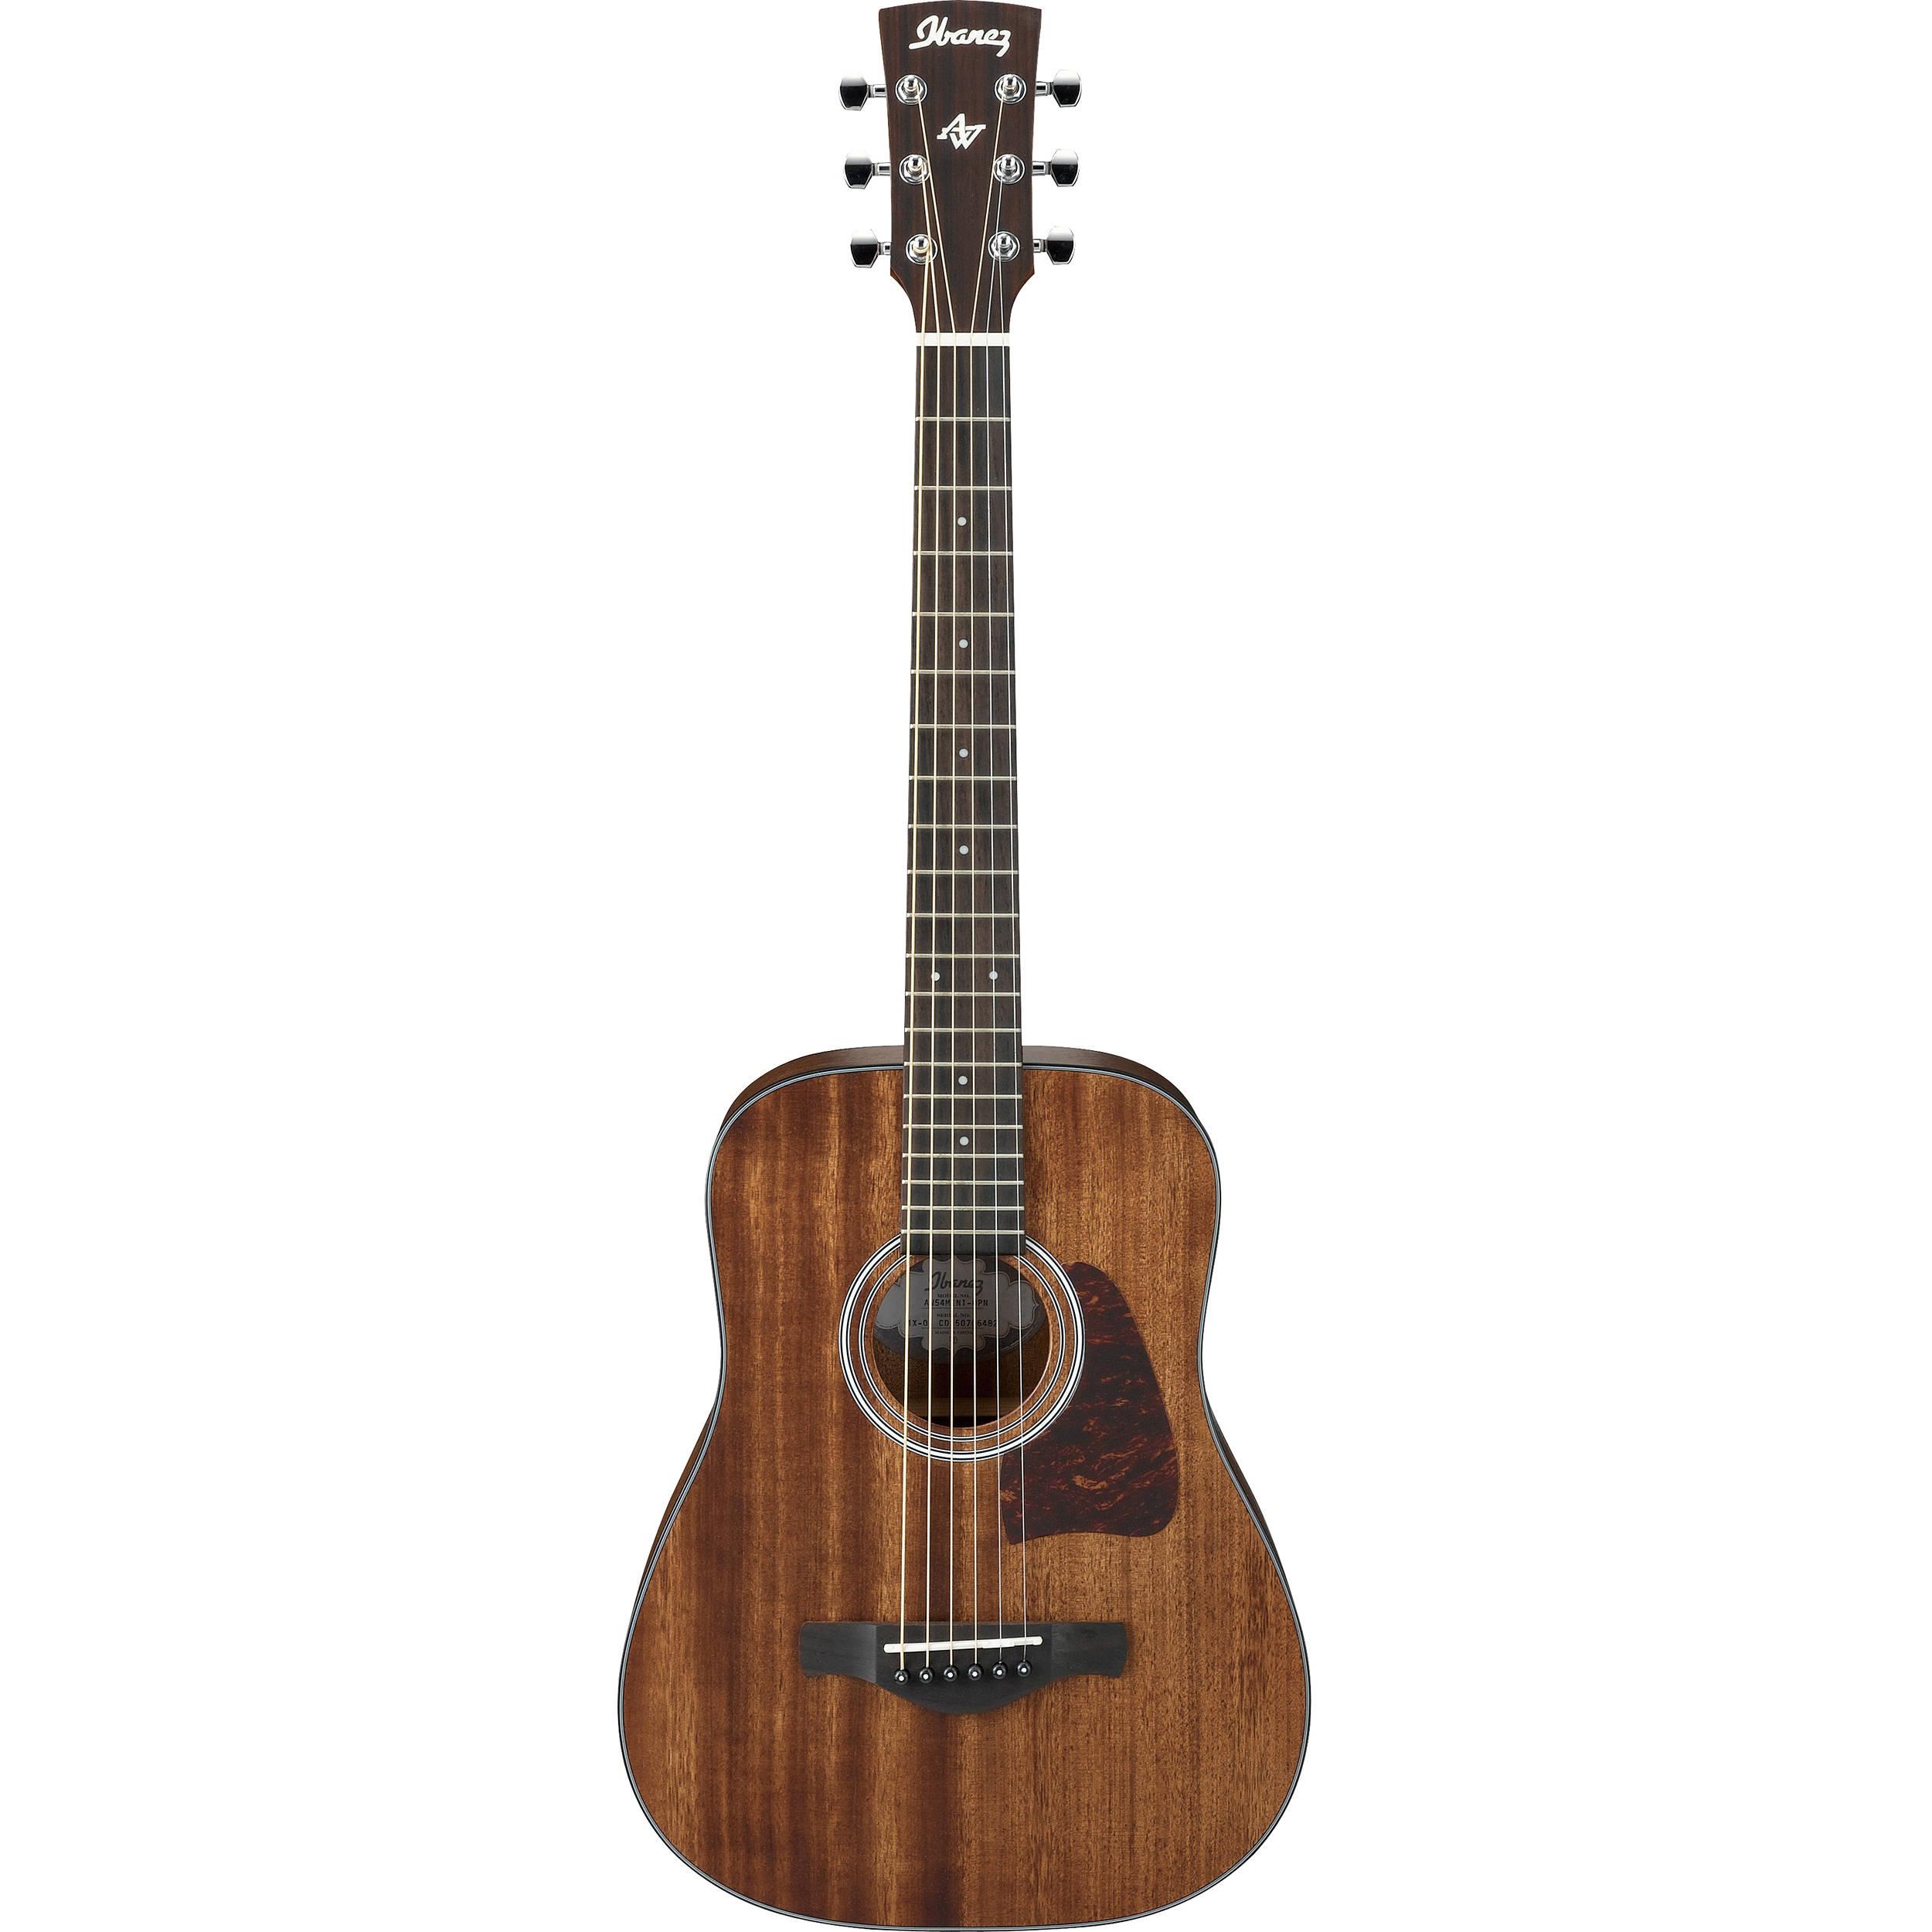 Dreadnought Guitar Size : ibanez aw54mini artwood series 3 4 size dreadnought aw54miniopn ~ Hamham.info Haus und Dekorationen